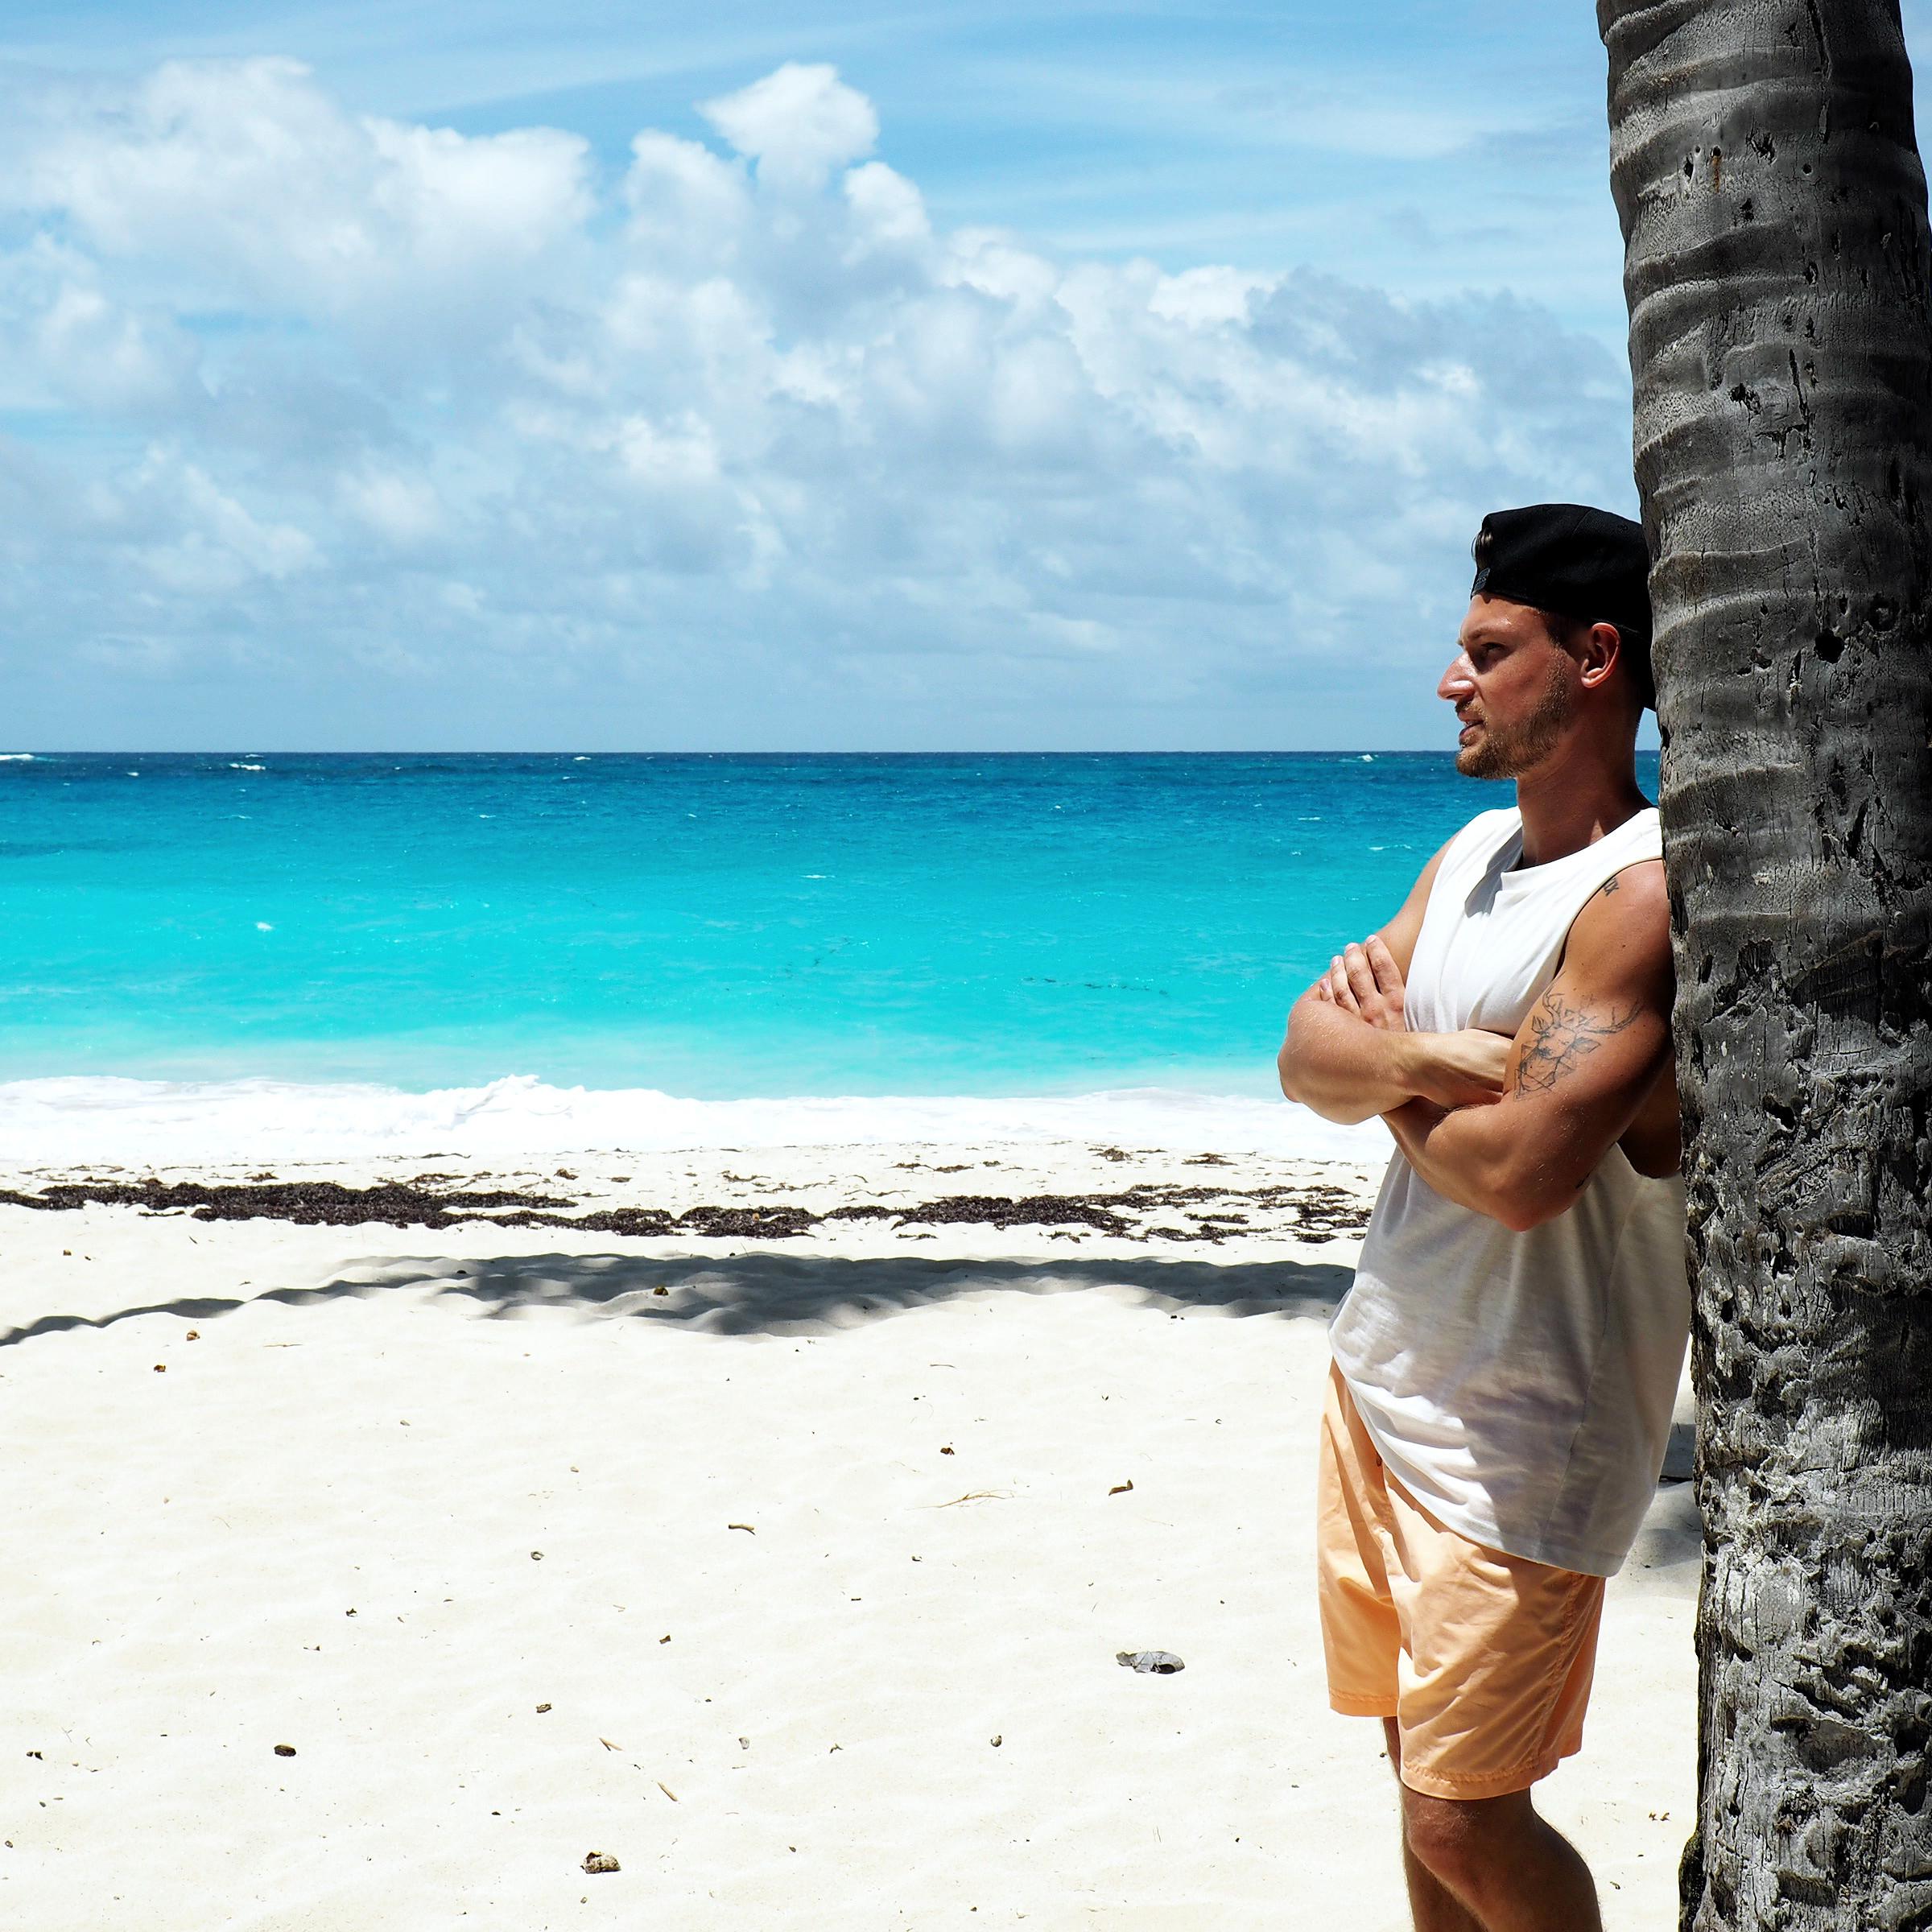 Tommeezjerry-Männerblog-Berlinblog-Fashionblog-Styleblog-Travelblog-Travel-Reiseblog-Reisen-Barbados-Karibik-Carribean-Summer-Sommer-Vacation-12